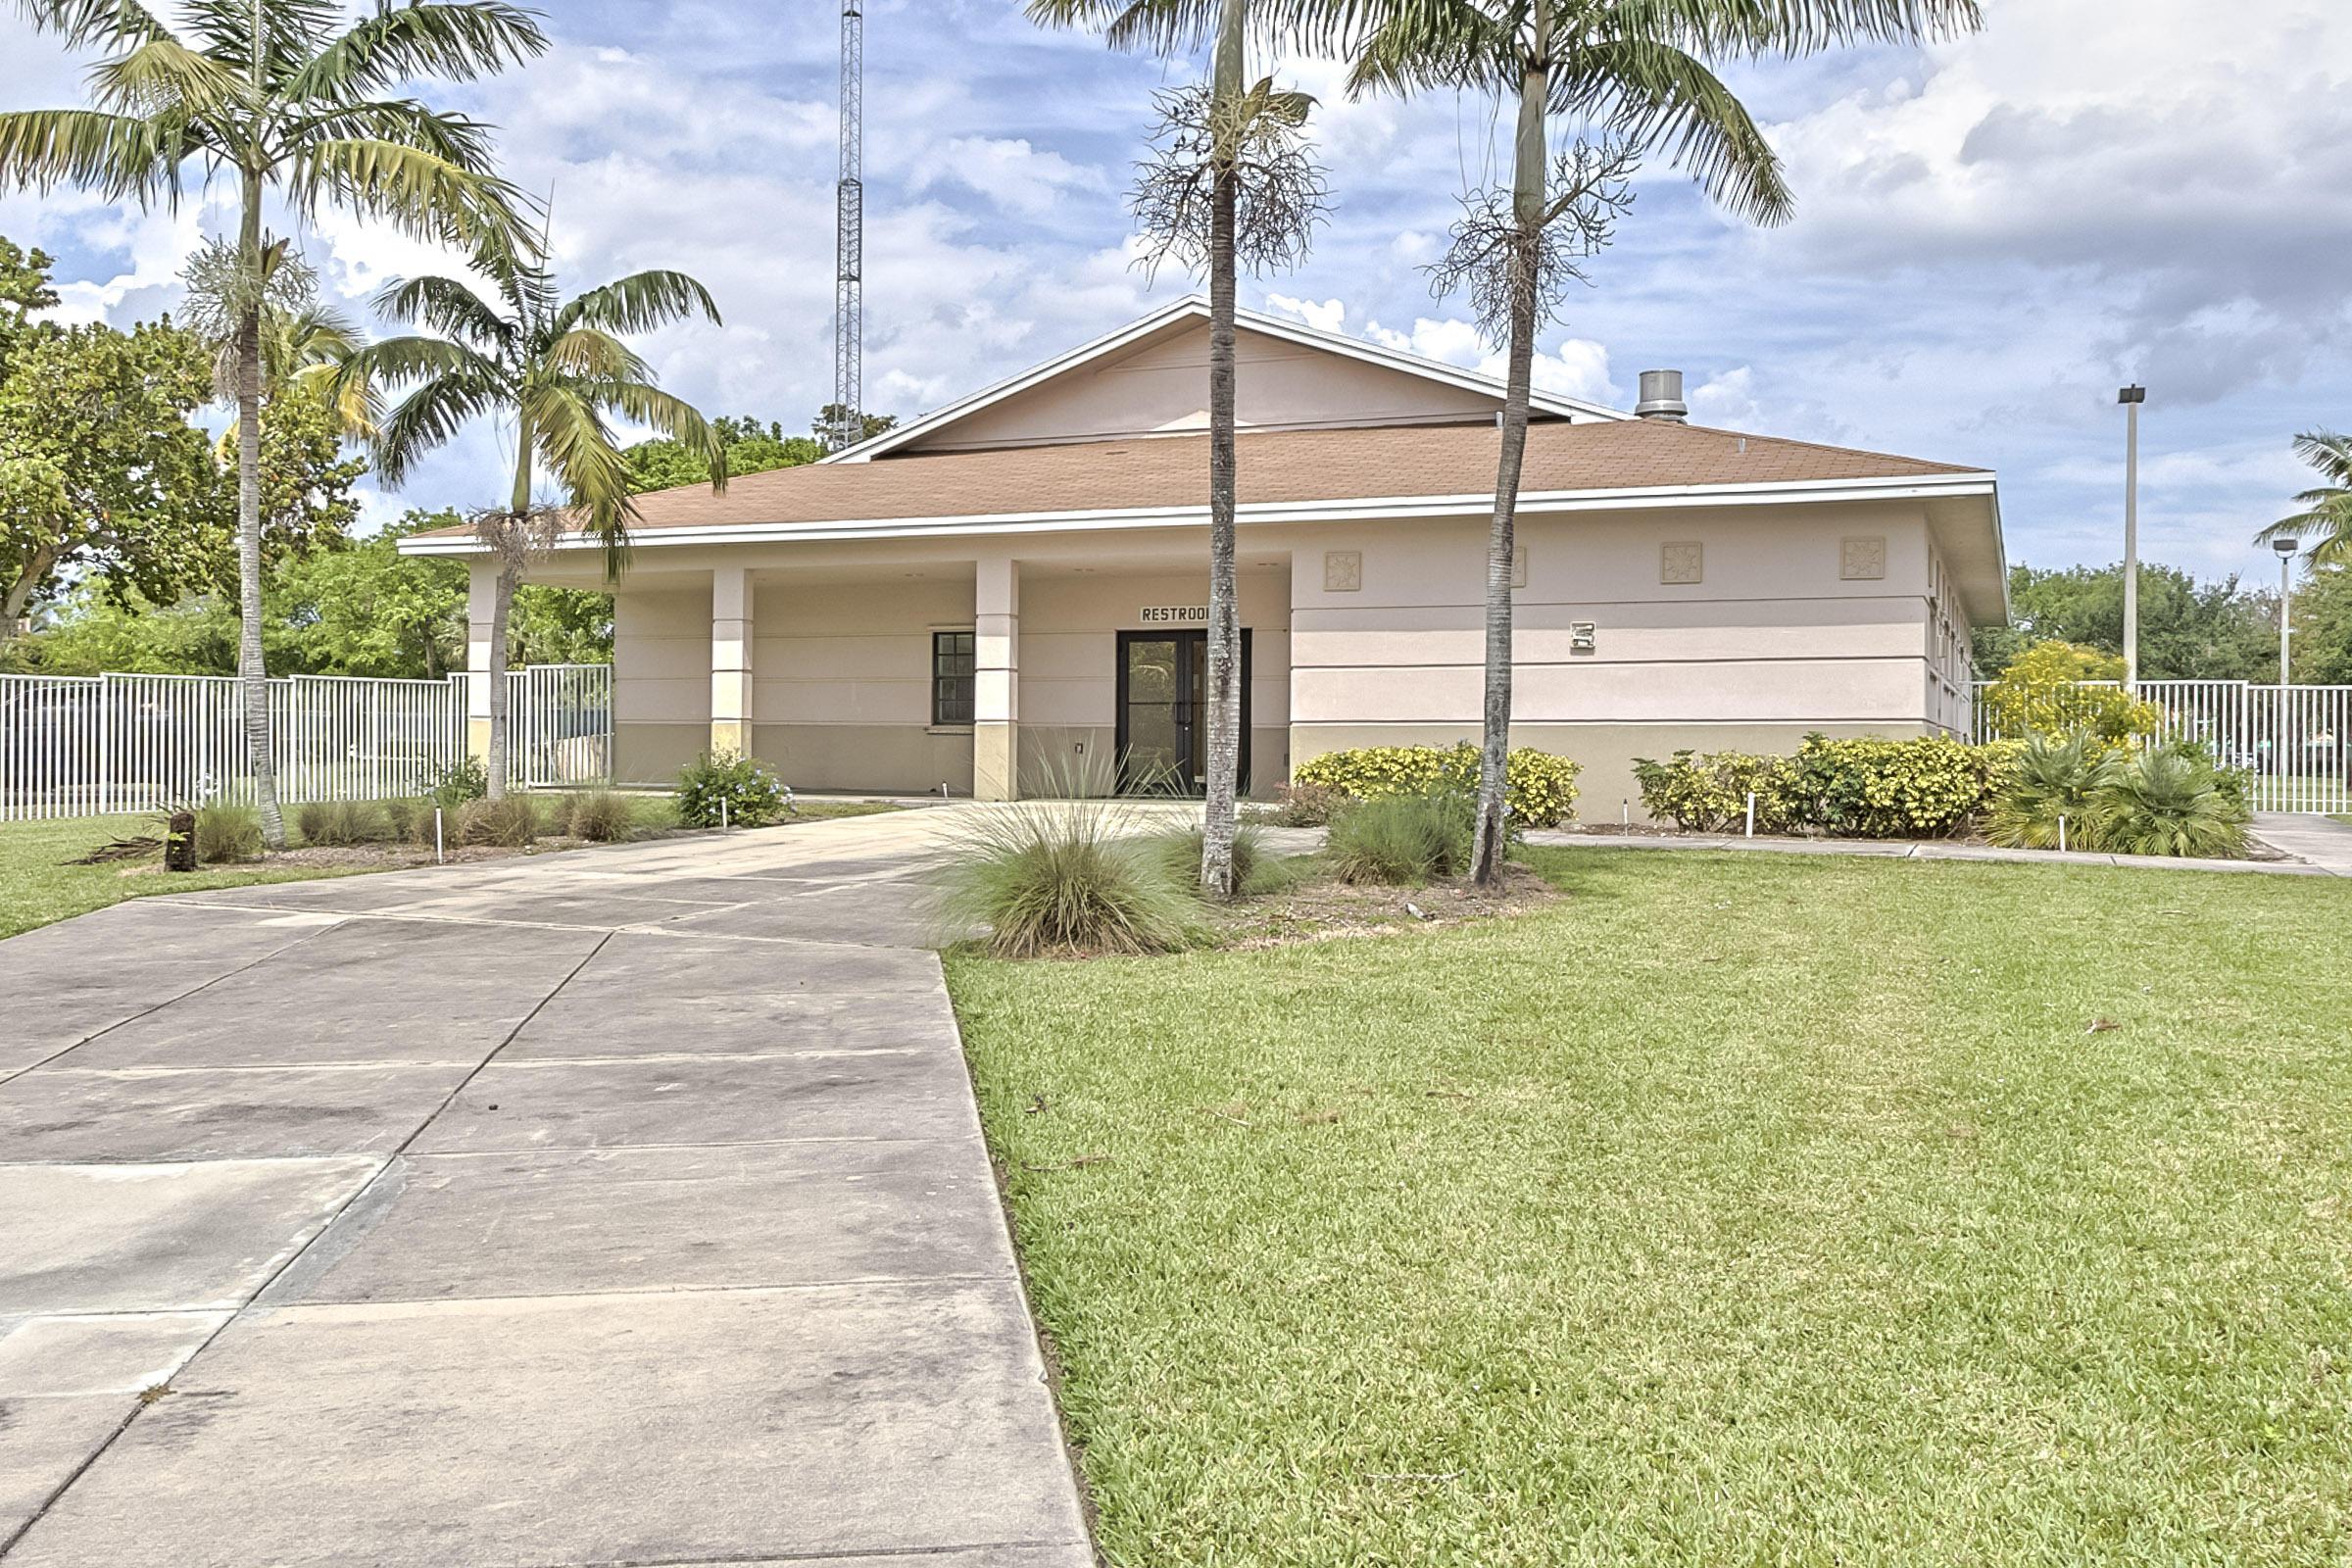 755 Dotterel Rd 1212, Delray Beach, FL 33444